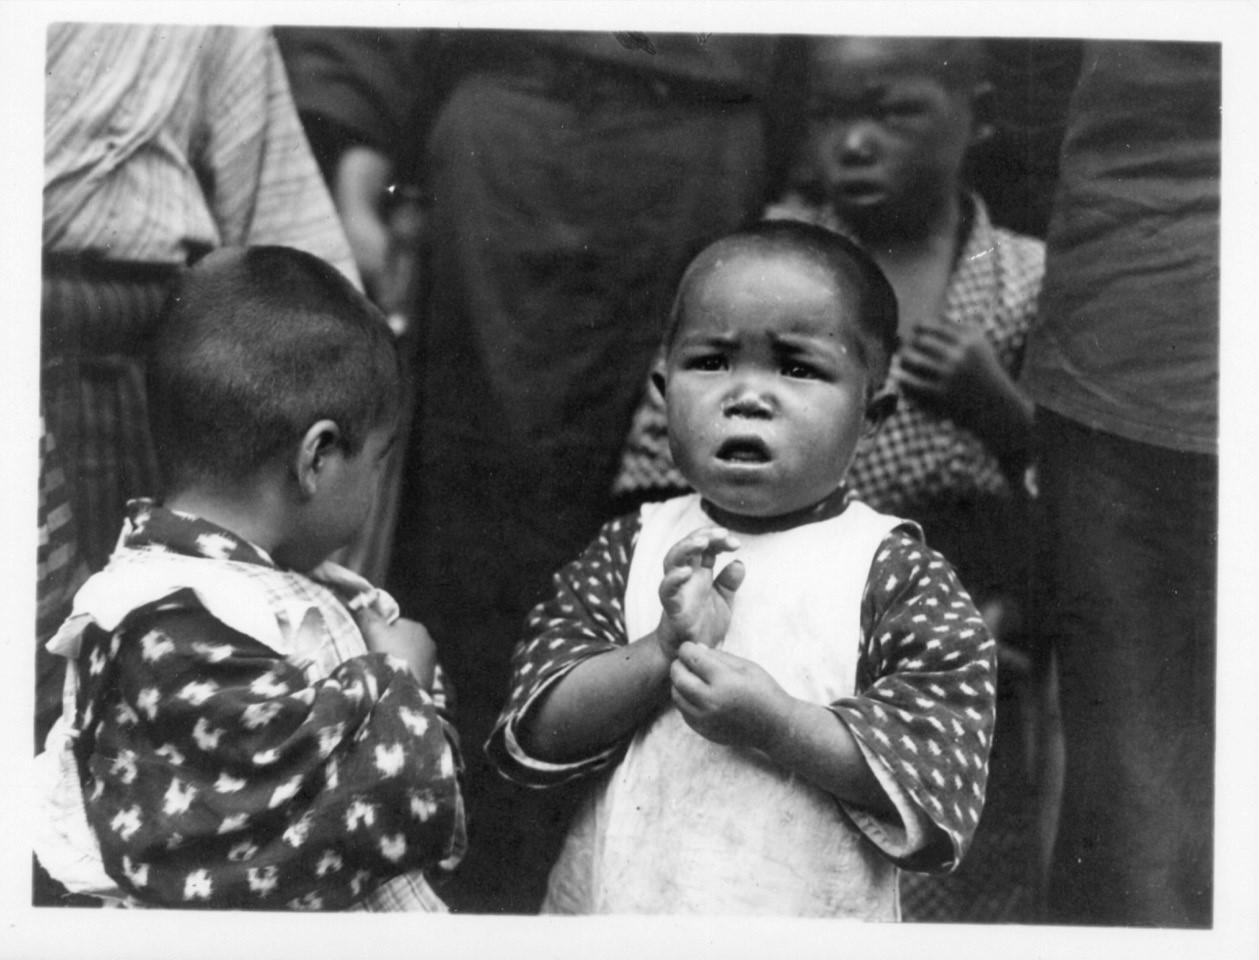 Kindergarten survivors of Hiroshima in 1946, Japan. PHOTO: RICHARD BAKER/WORLD OUTLOOK, GENERAL COMMISSION ON ARCHIVES AND HISTORY